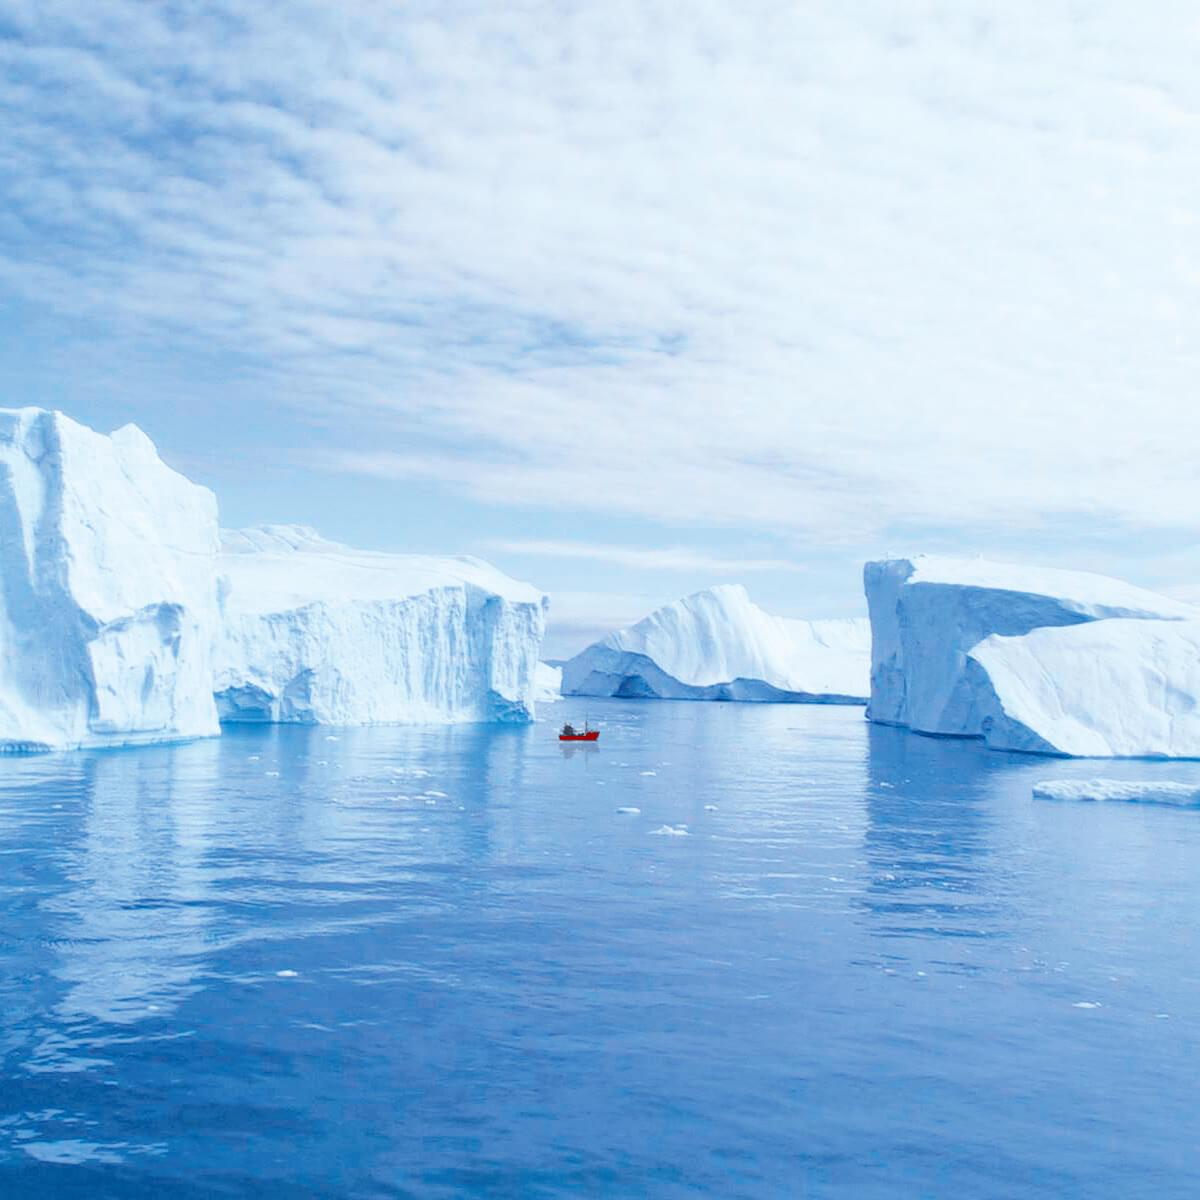 A boat near Aasiaat inbetween large icebergs.